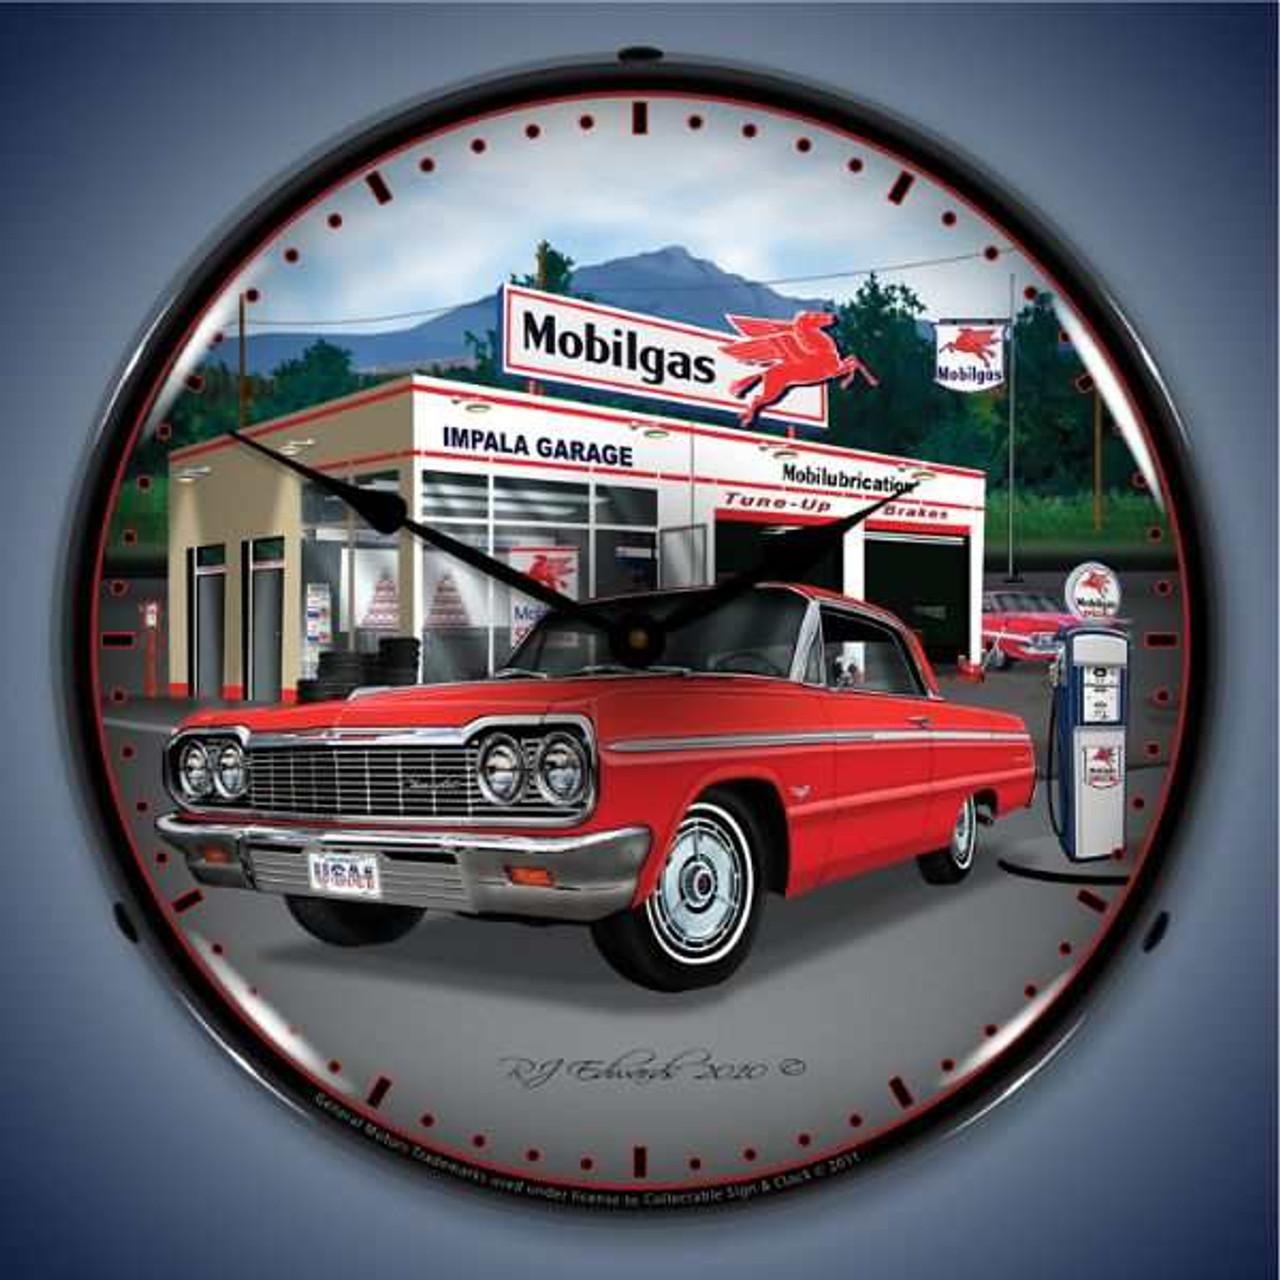 Retro  1964 Impala Garage Lighted Wall Clock 14 x 14 Inches